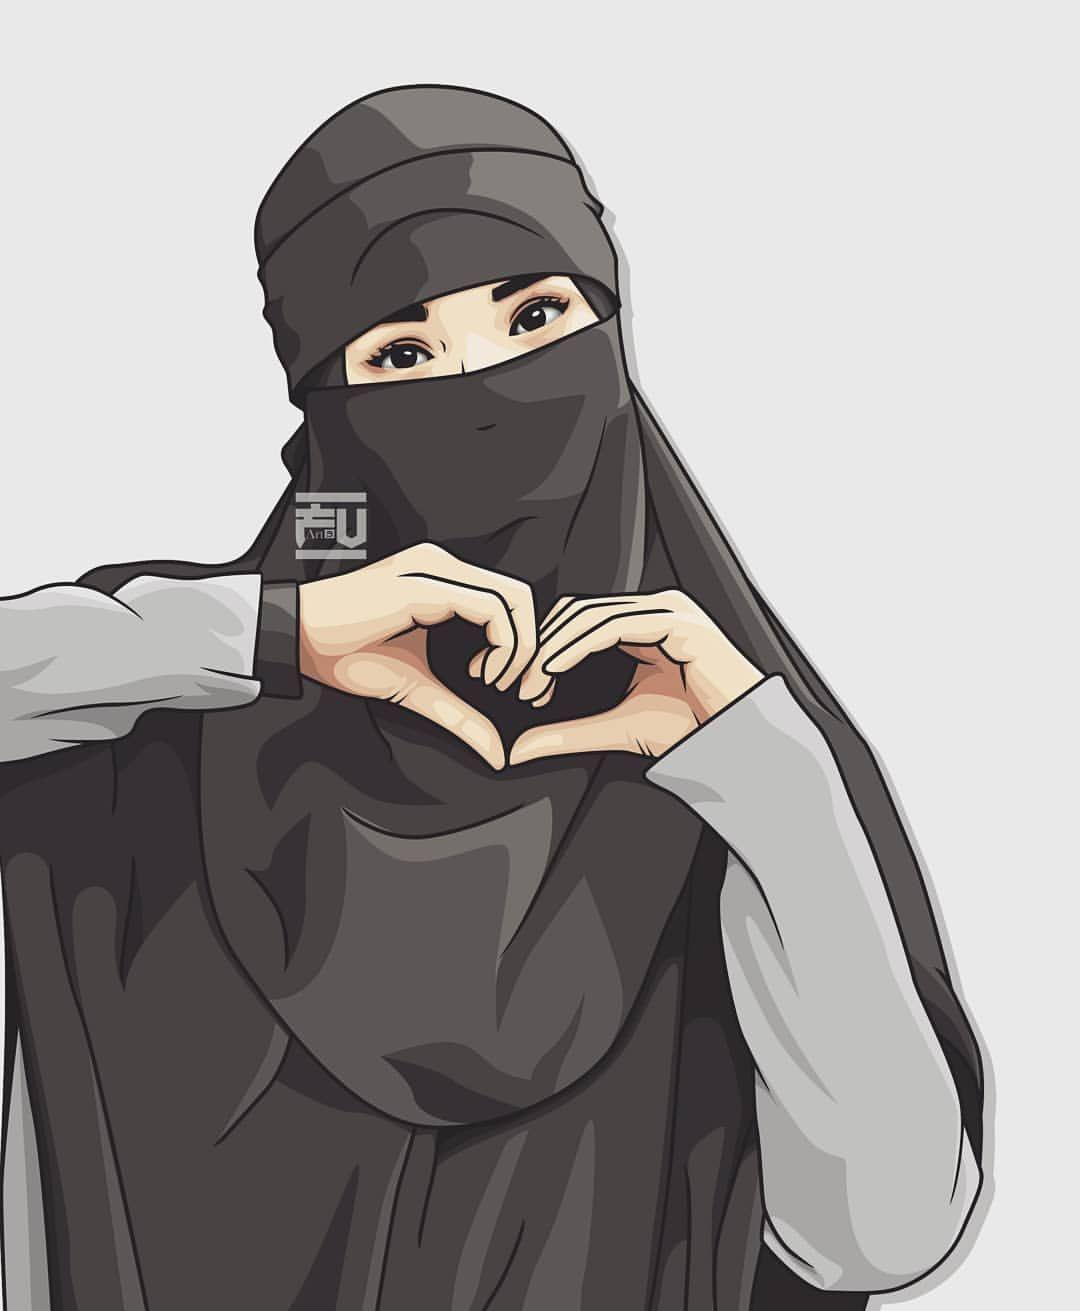 Terbaik 55+ Wanita Muslimah Cantik Gambar Orang Bercadar Kartun